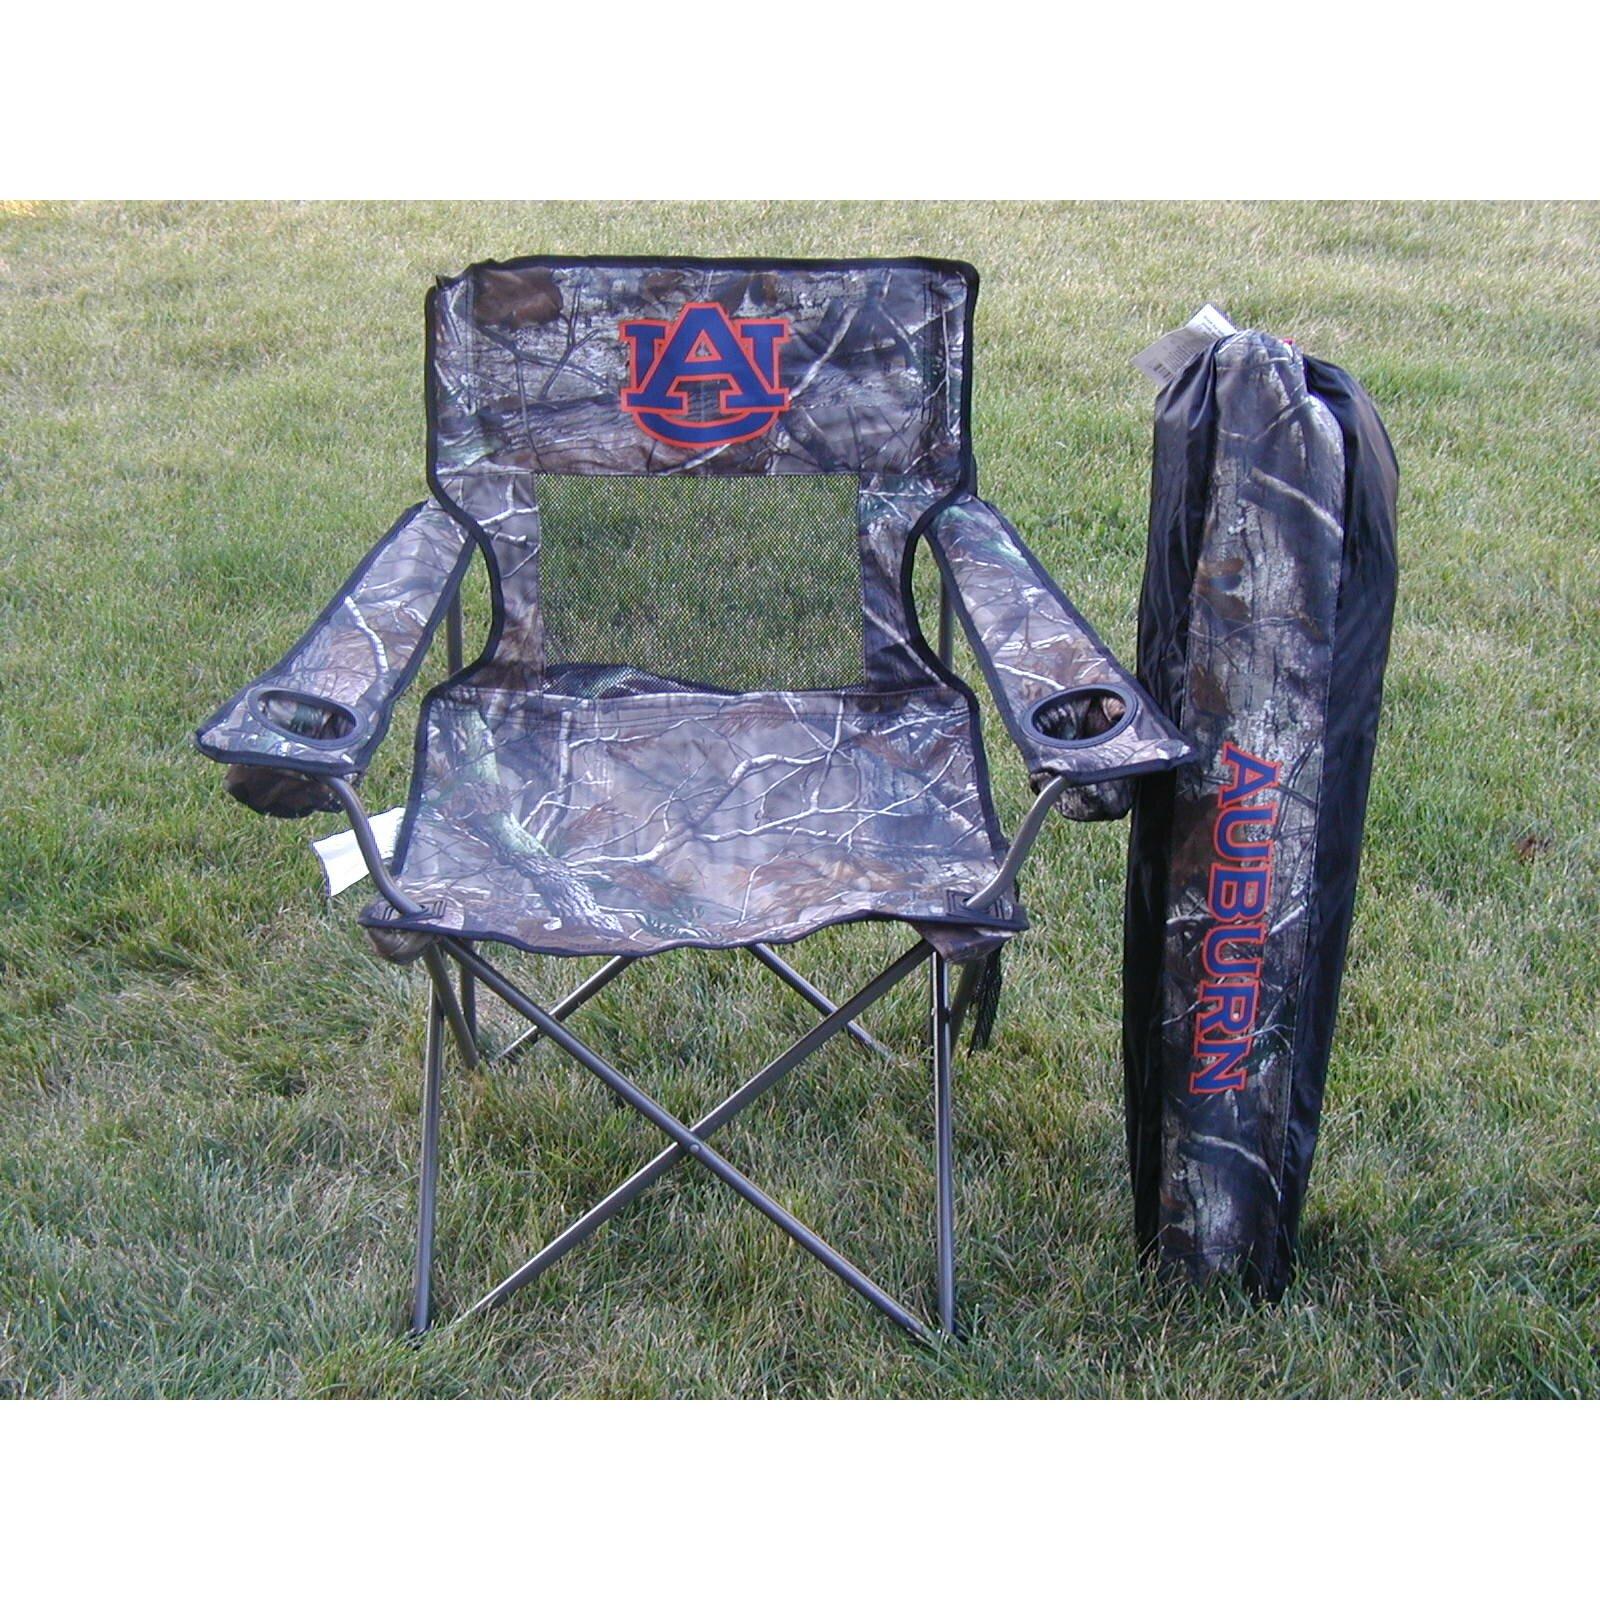 Ncaa Realtree Camo Chair Wayfair